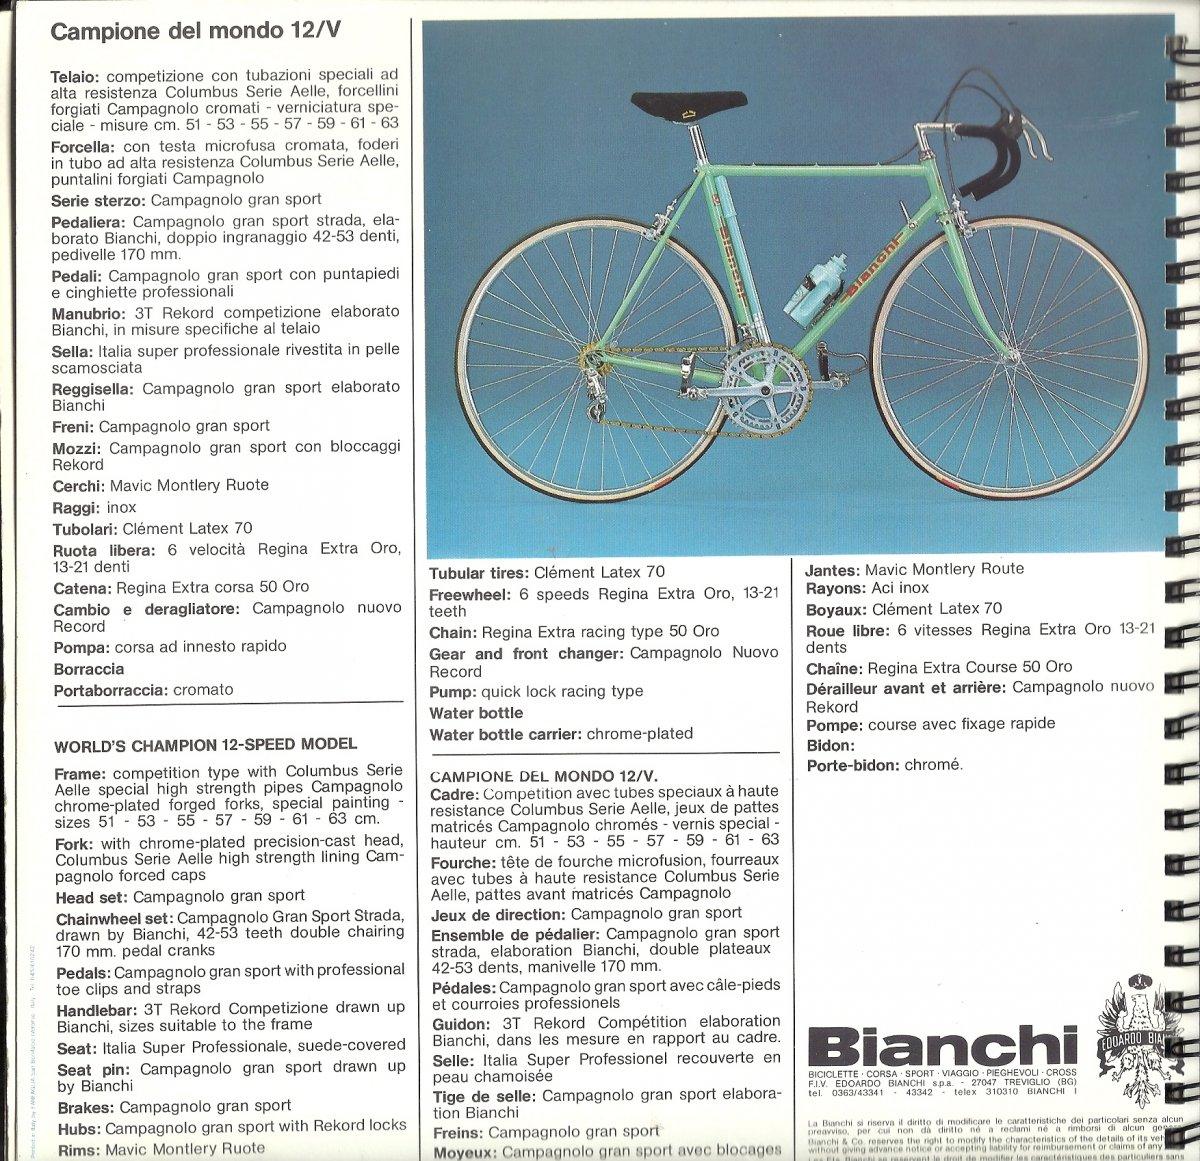 Campione del Mondo 12 V 1979-81.2.jpg